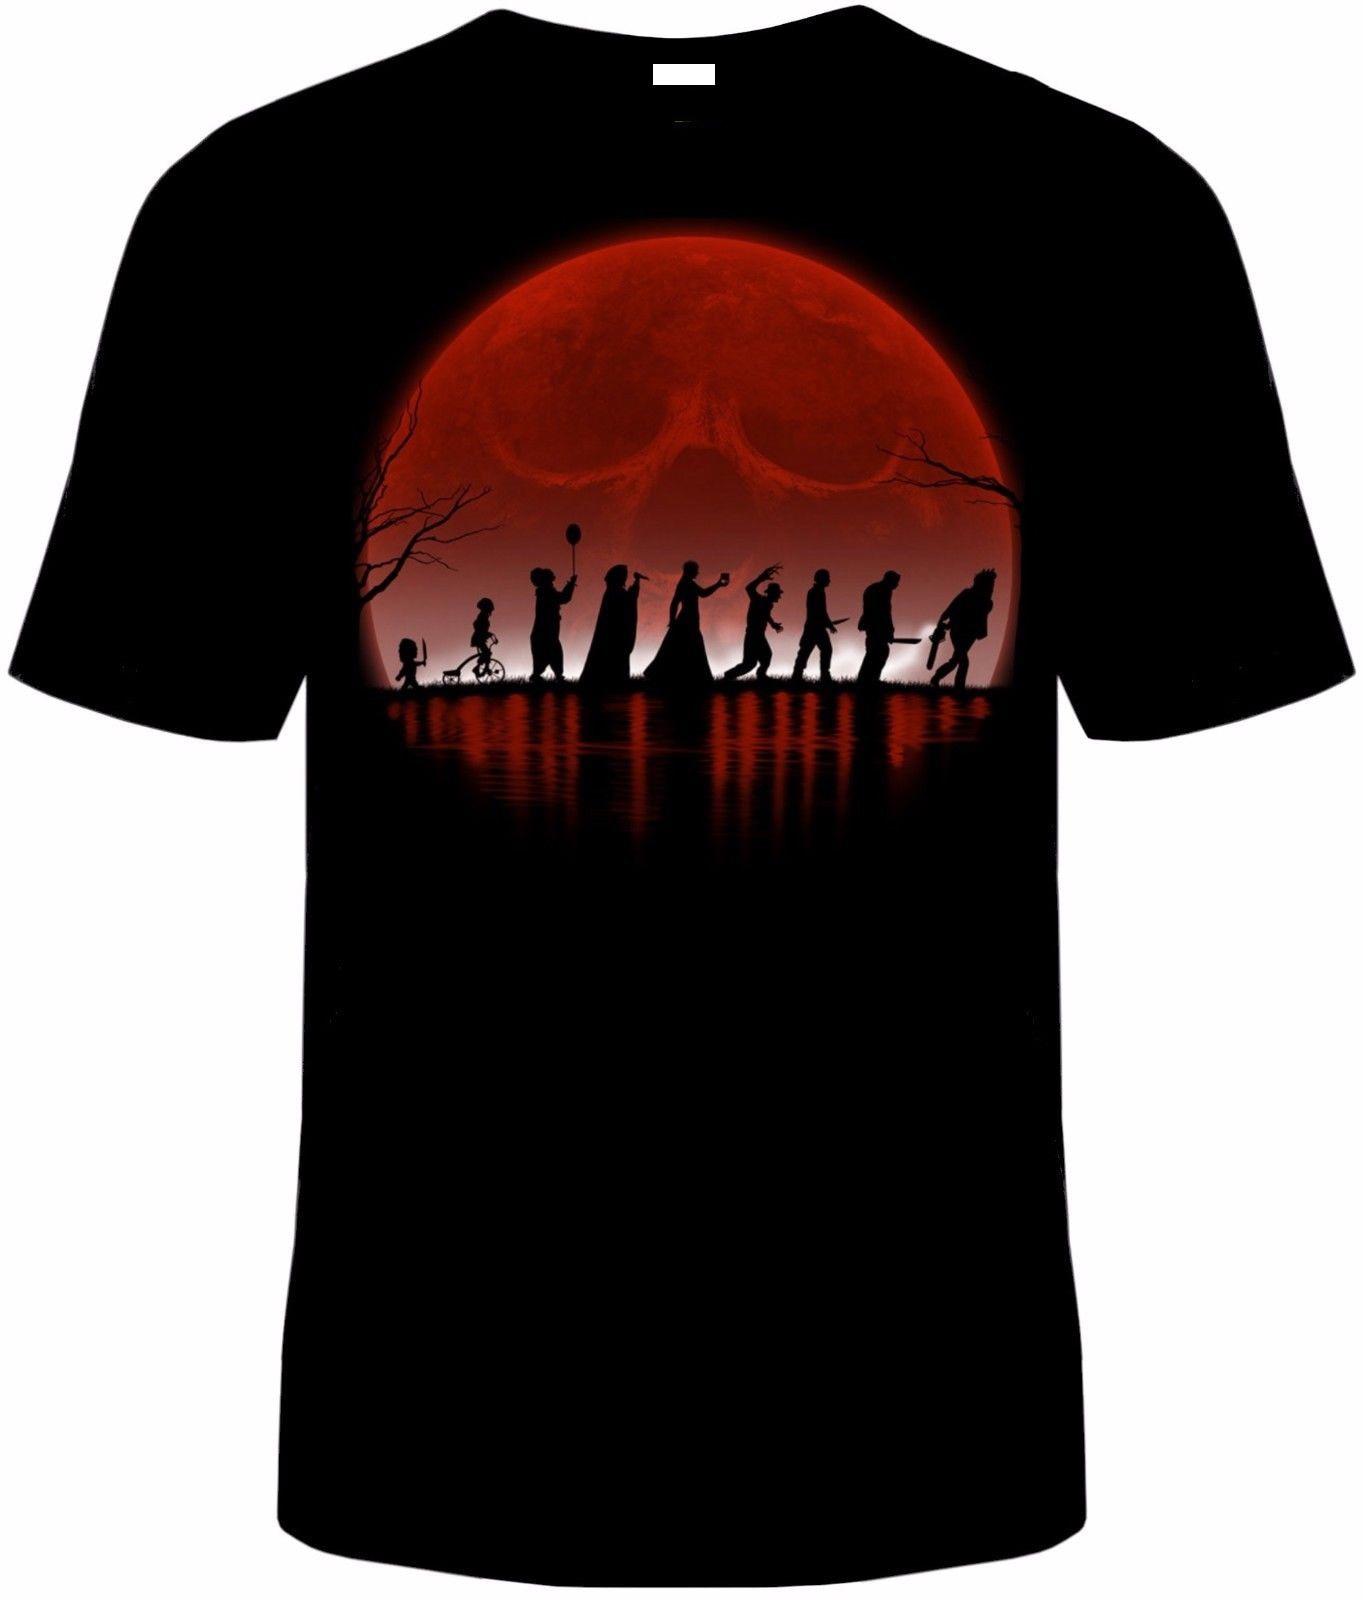 Killers T-Shirt Unisex Horror Scary Sizes IT Freddy Texas Saw Chucky Halloween Geek Pulp Fiction Naruto T Shirt Hip Hop